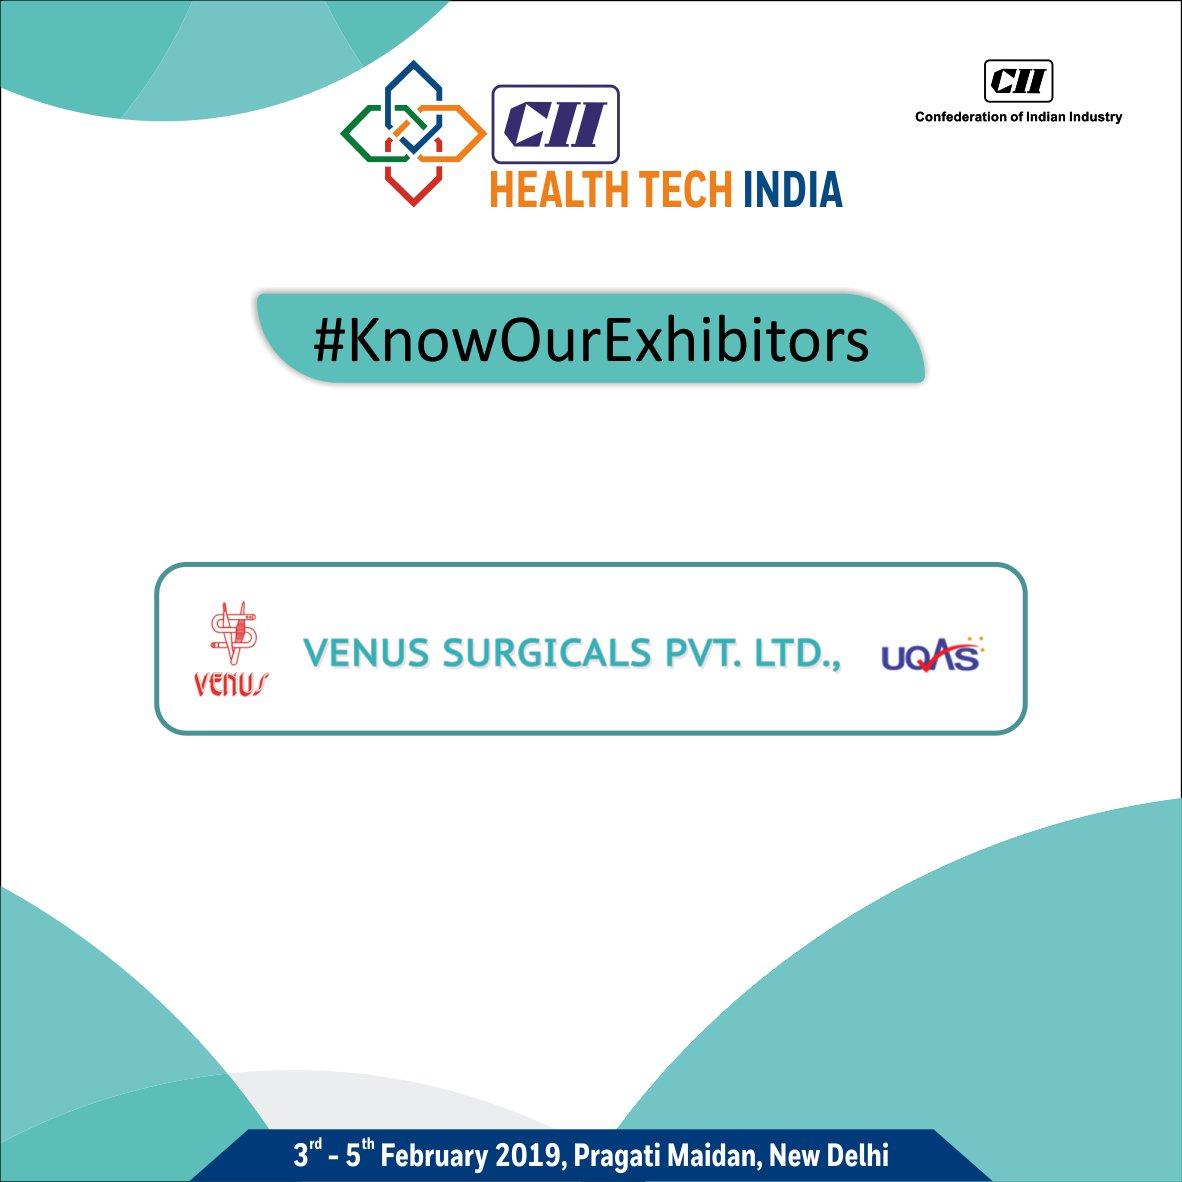 Health Tech India on Twitter: